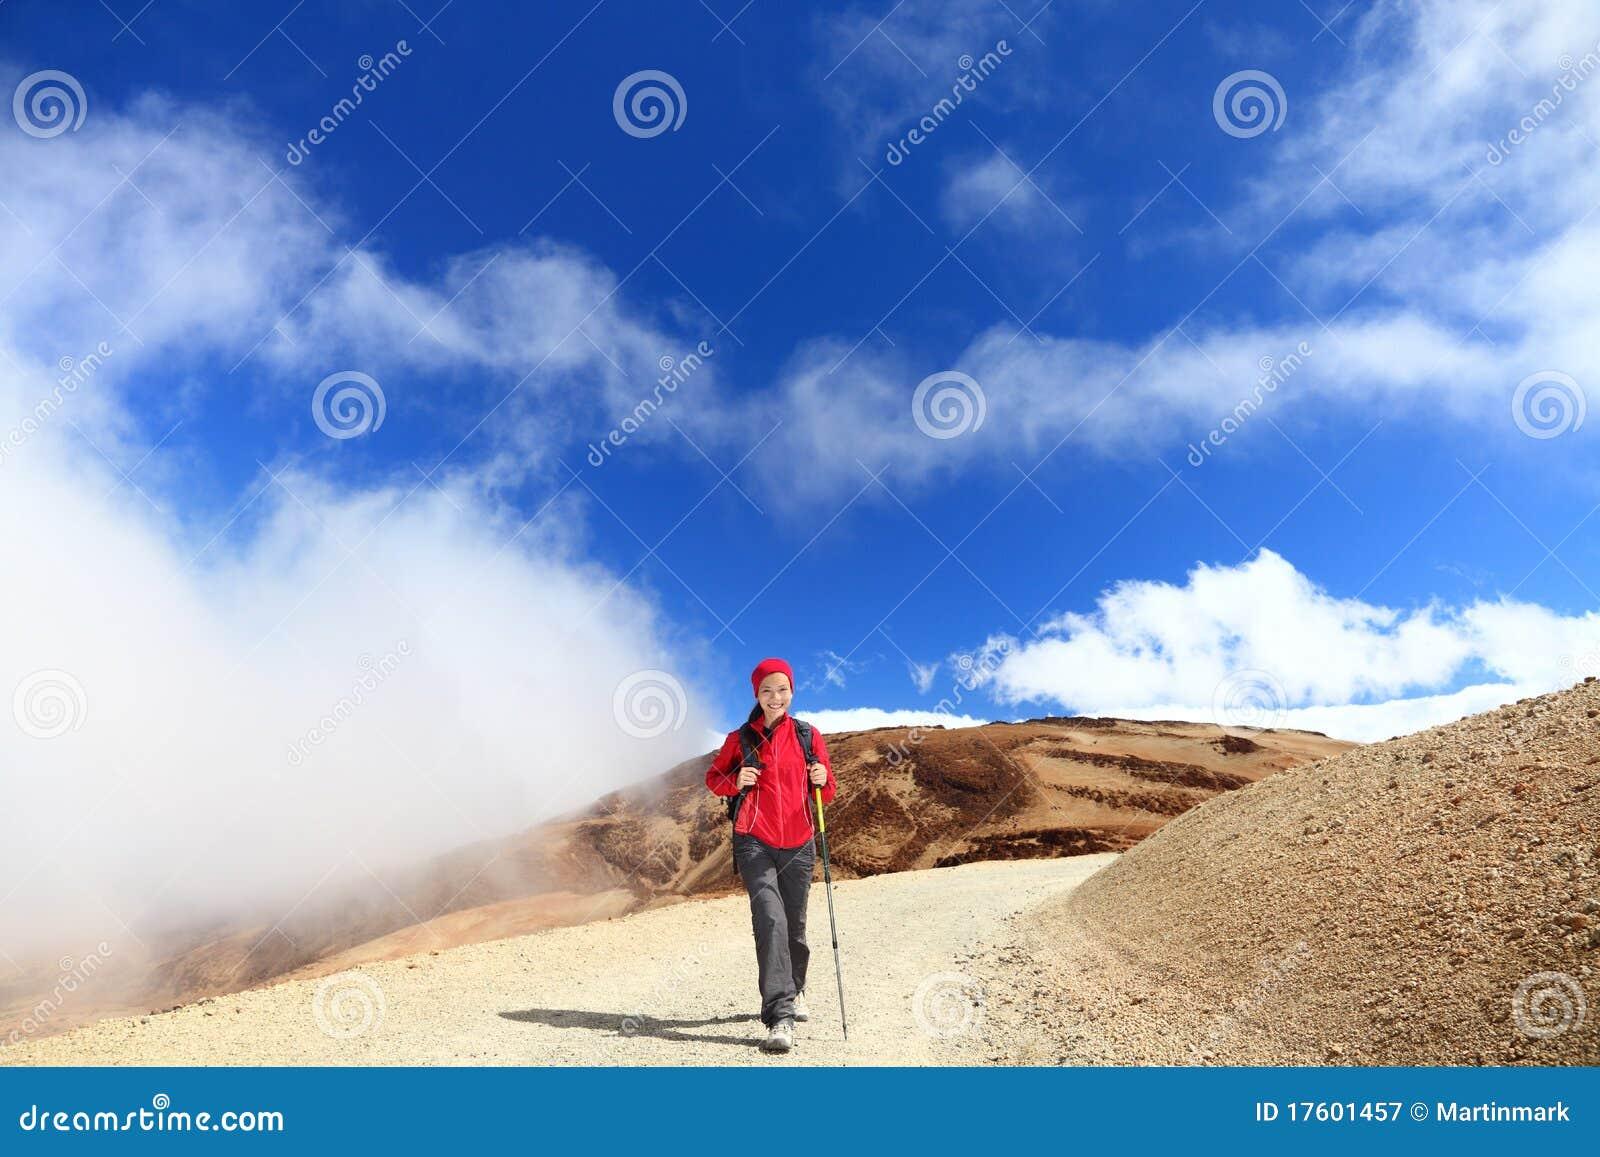 Hiking облаков